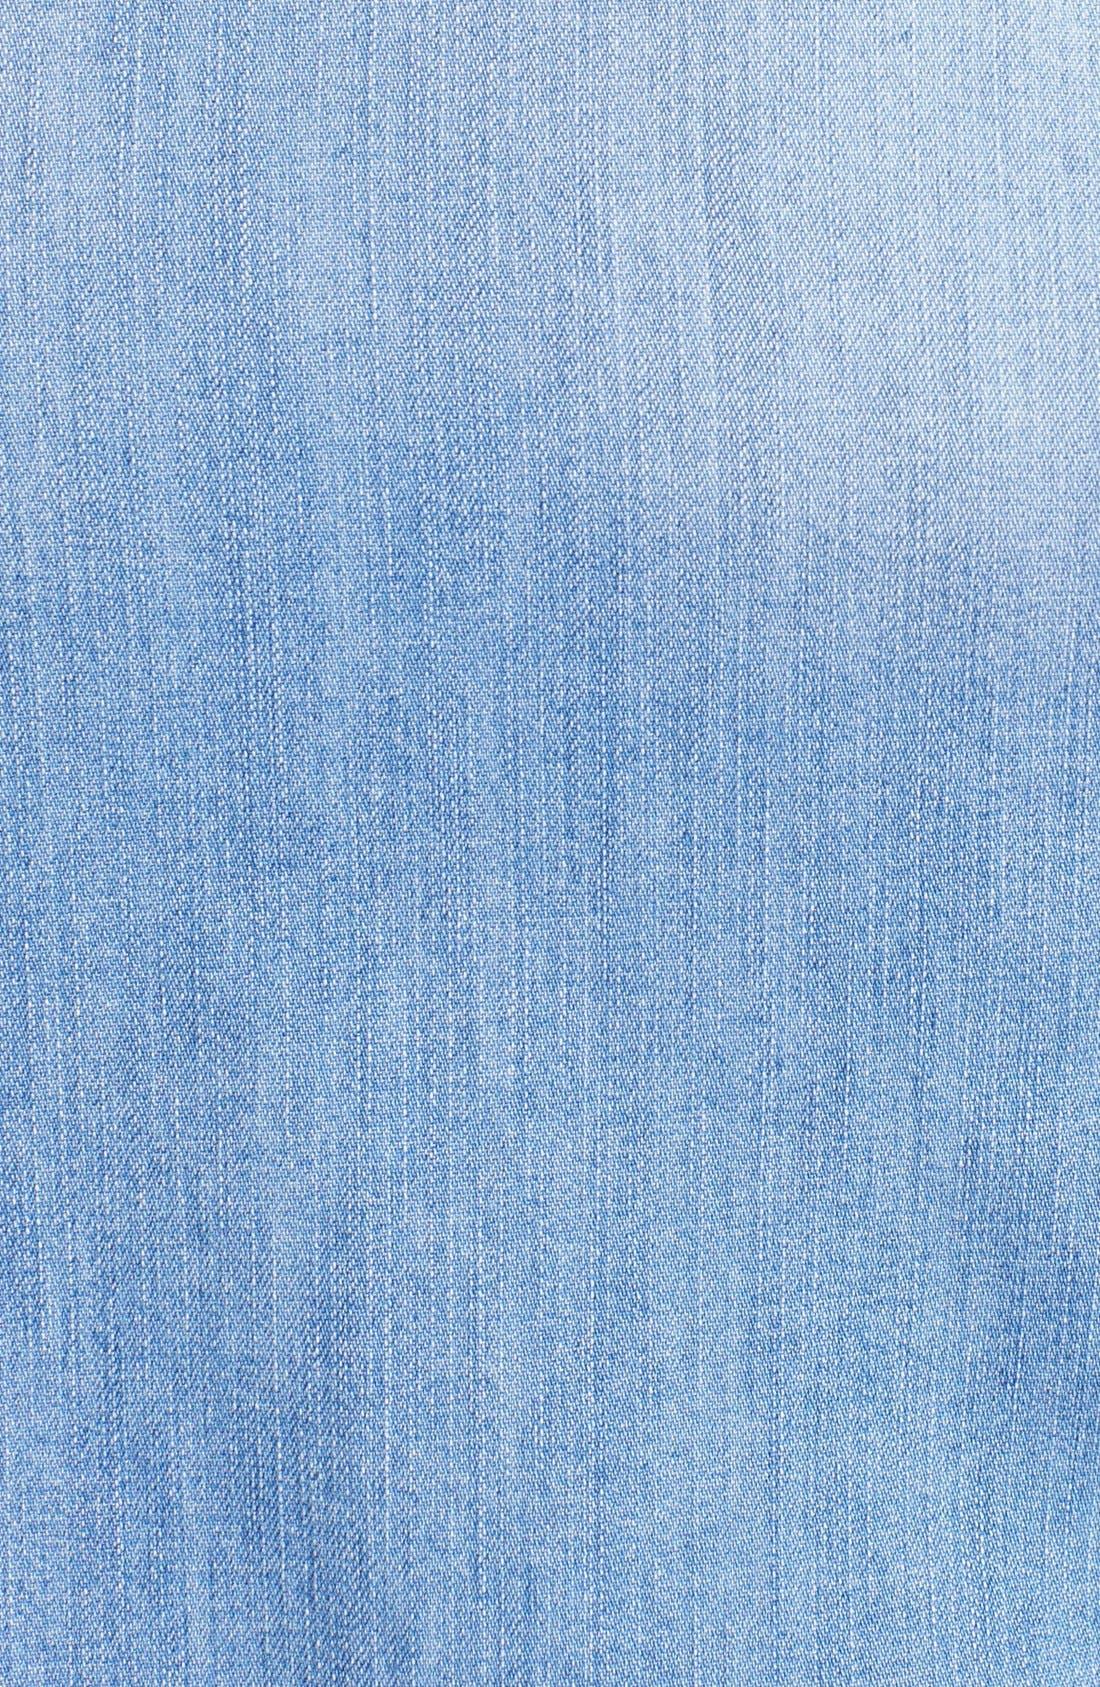 Alternate Image 3  - DIESEL® 'Sonora' Chambray Denim Shirt